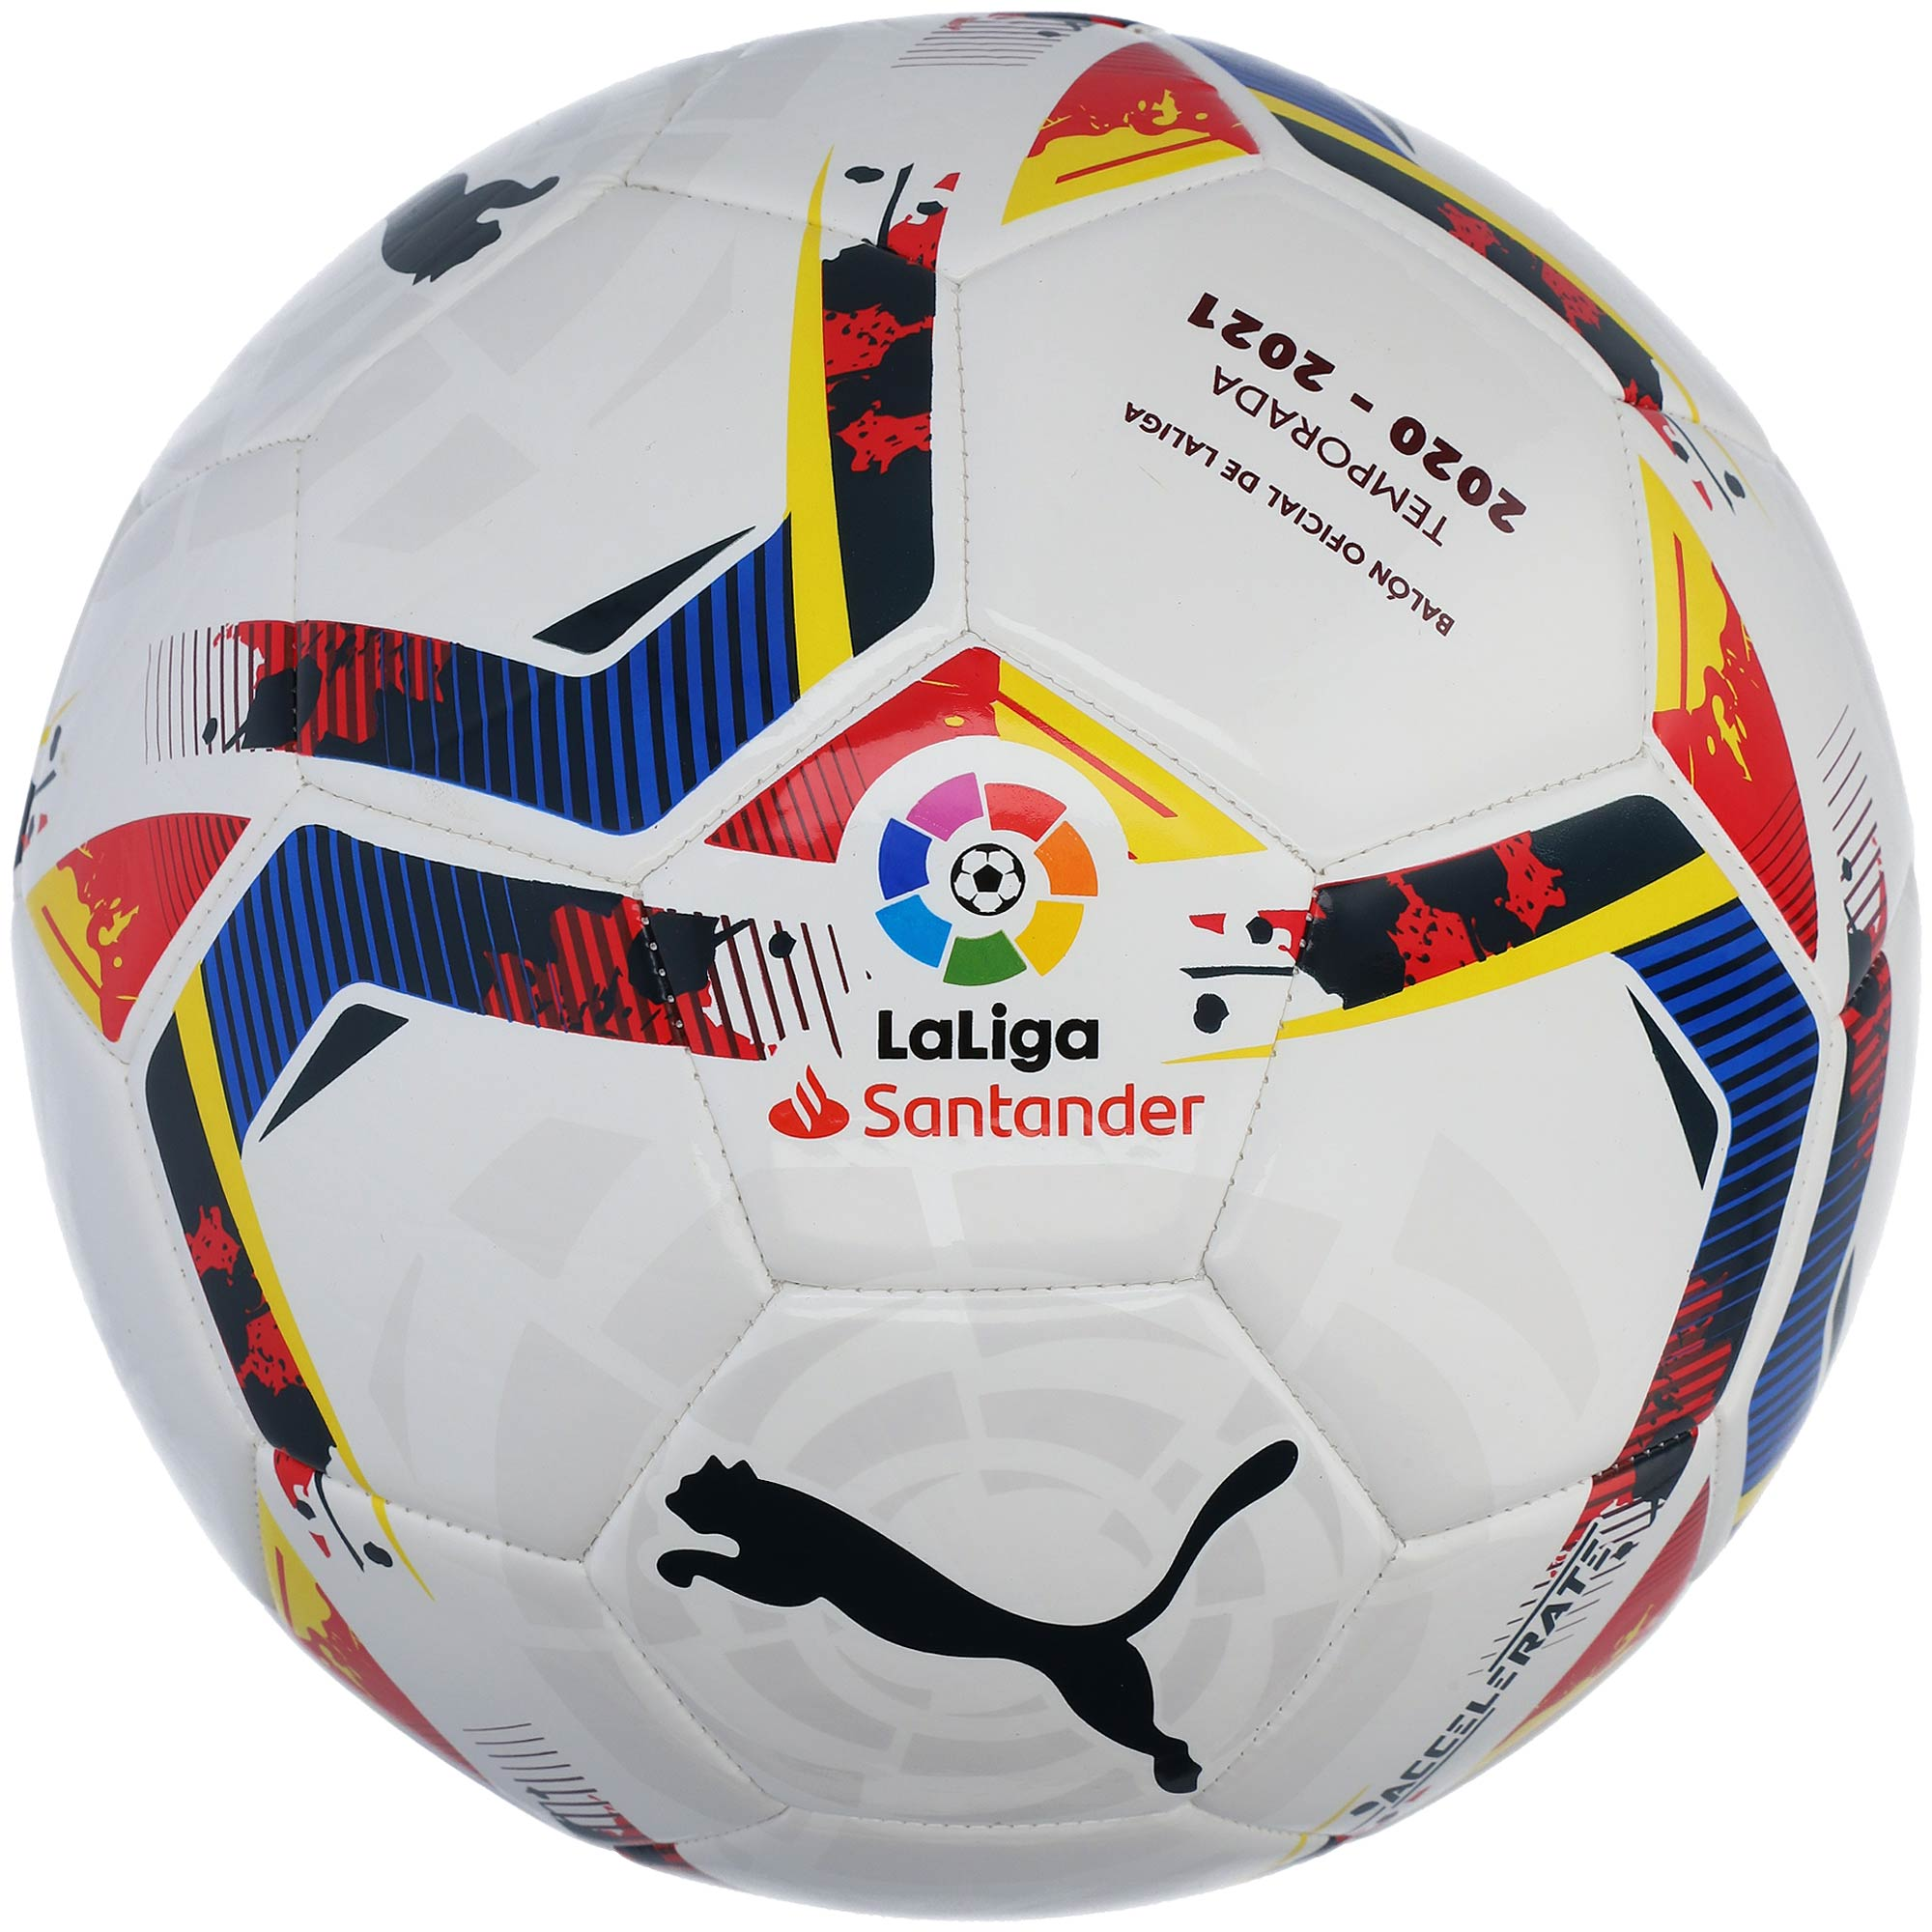 puma la liga puma 2020 2021 acelerar soccer ball walmart com walmart com puma la liga puma 2020 2021 acelerar soccer ball walmart com